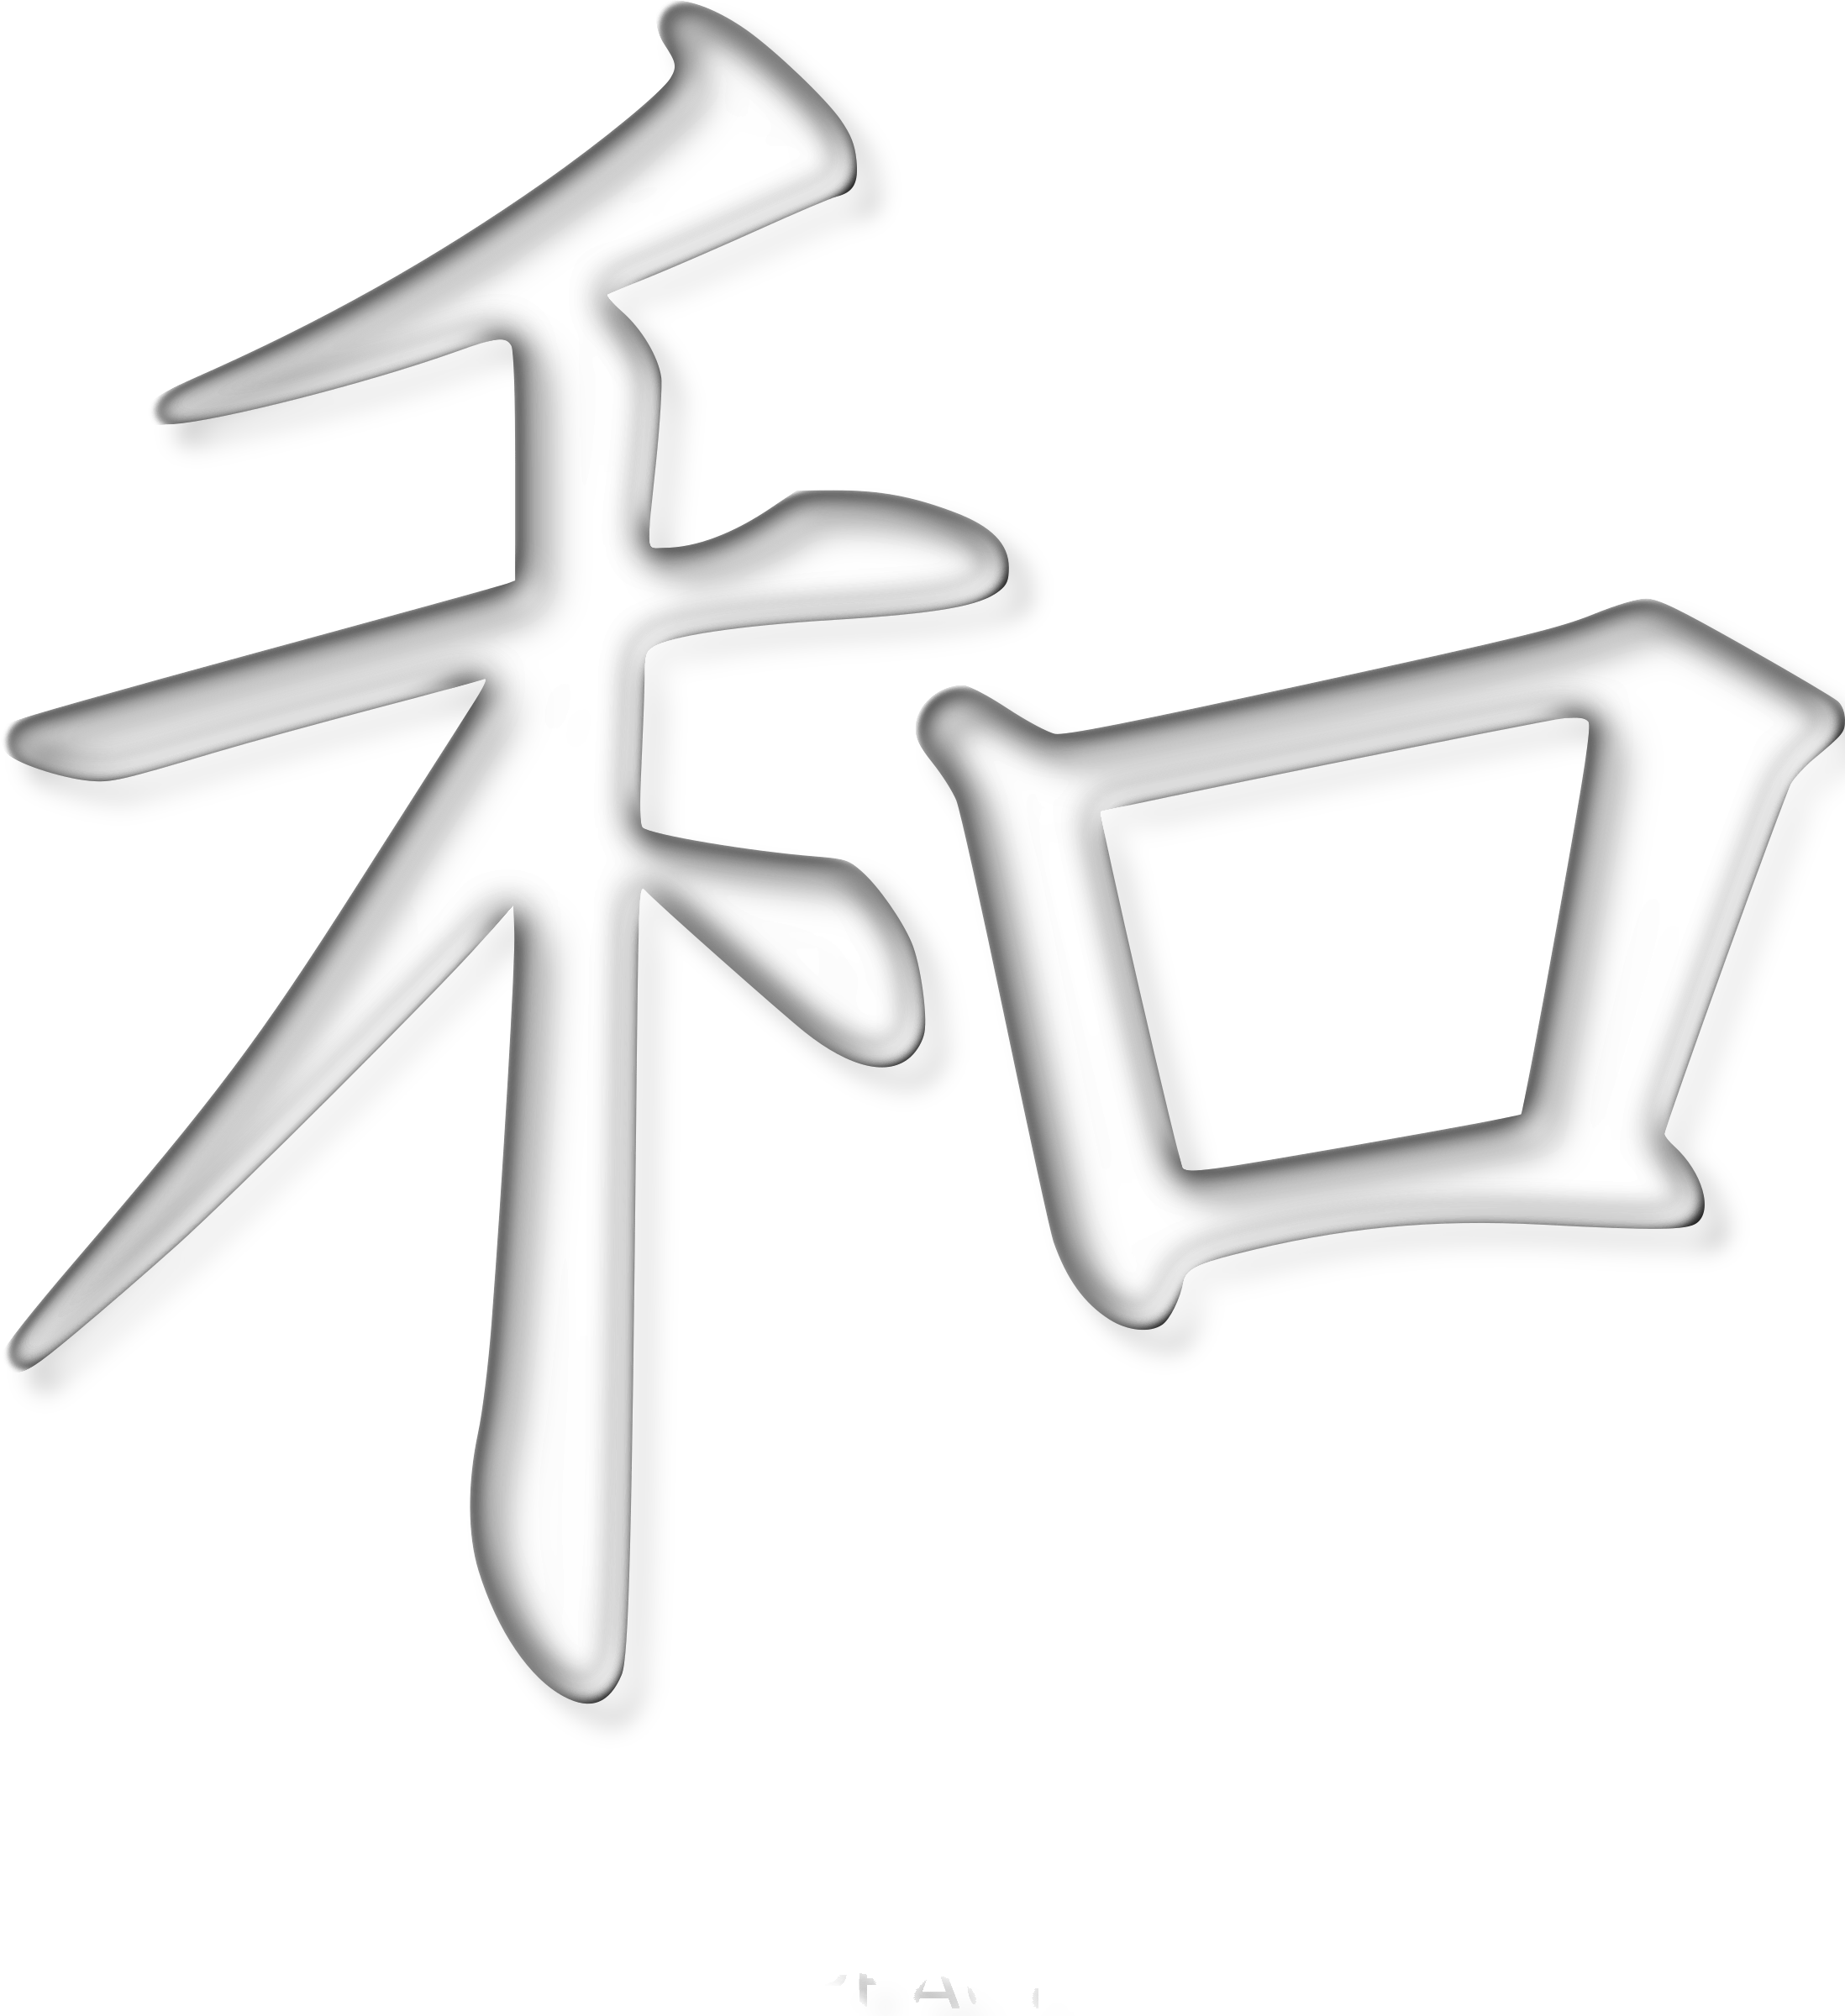 kisspng-kanji-peace-symbols-kanji-5acb458826dd35.5636289915232710481592